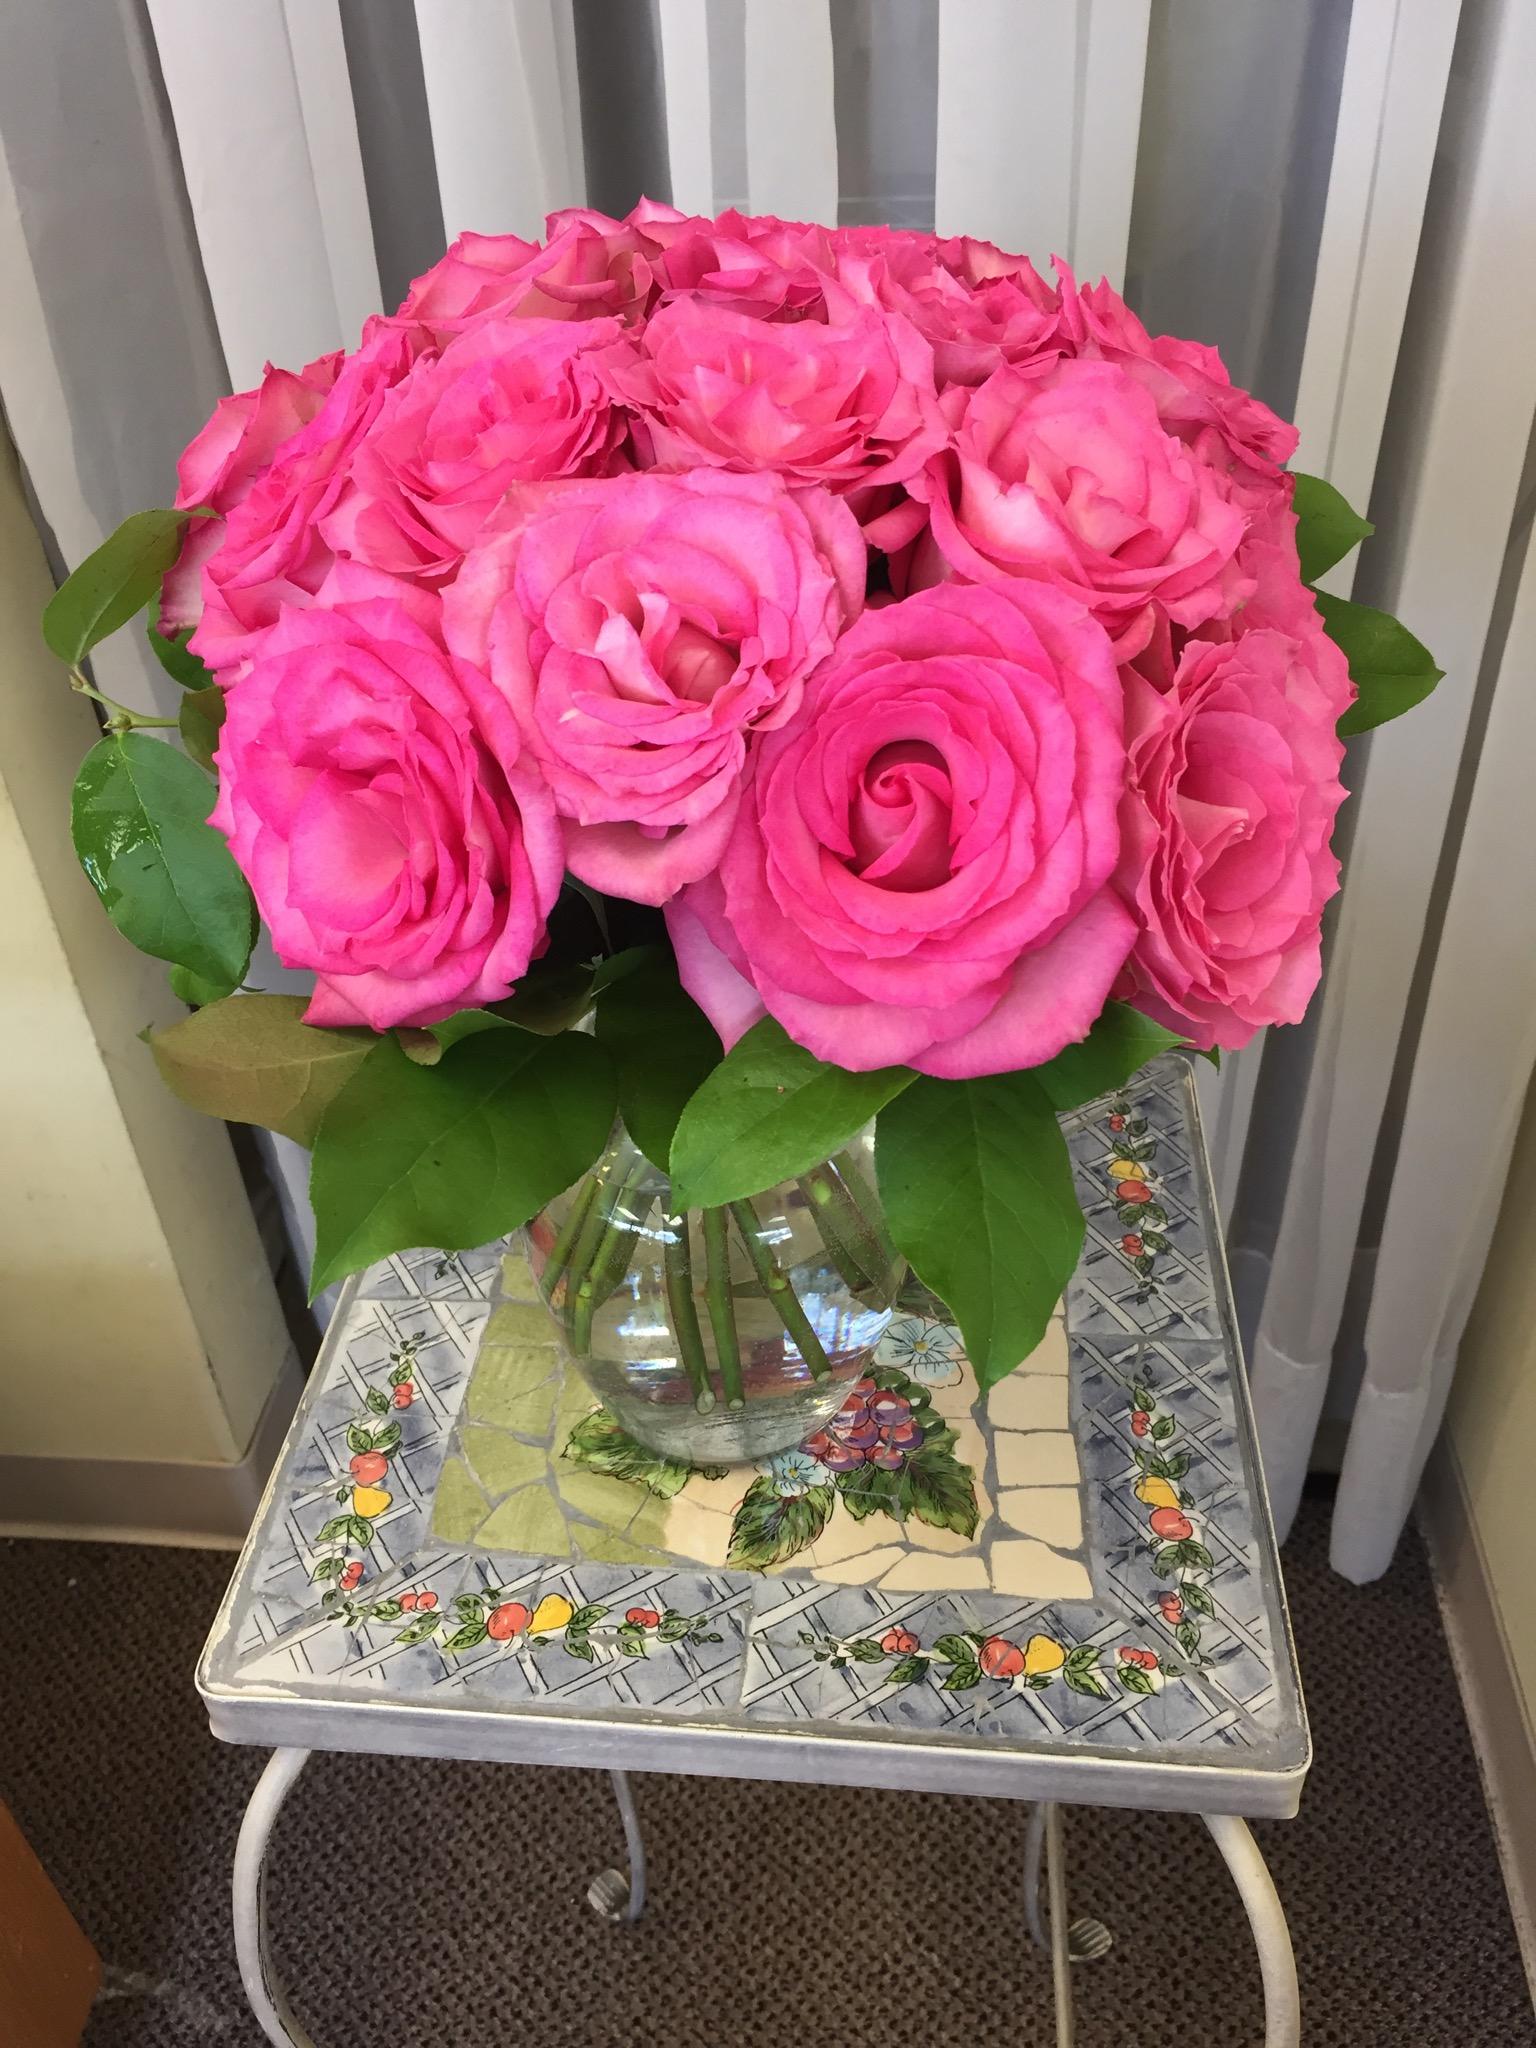 Dozen Roses - Vase Arrangement